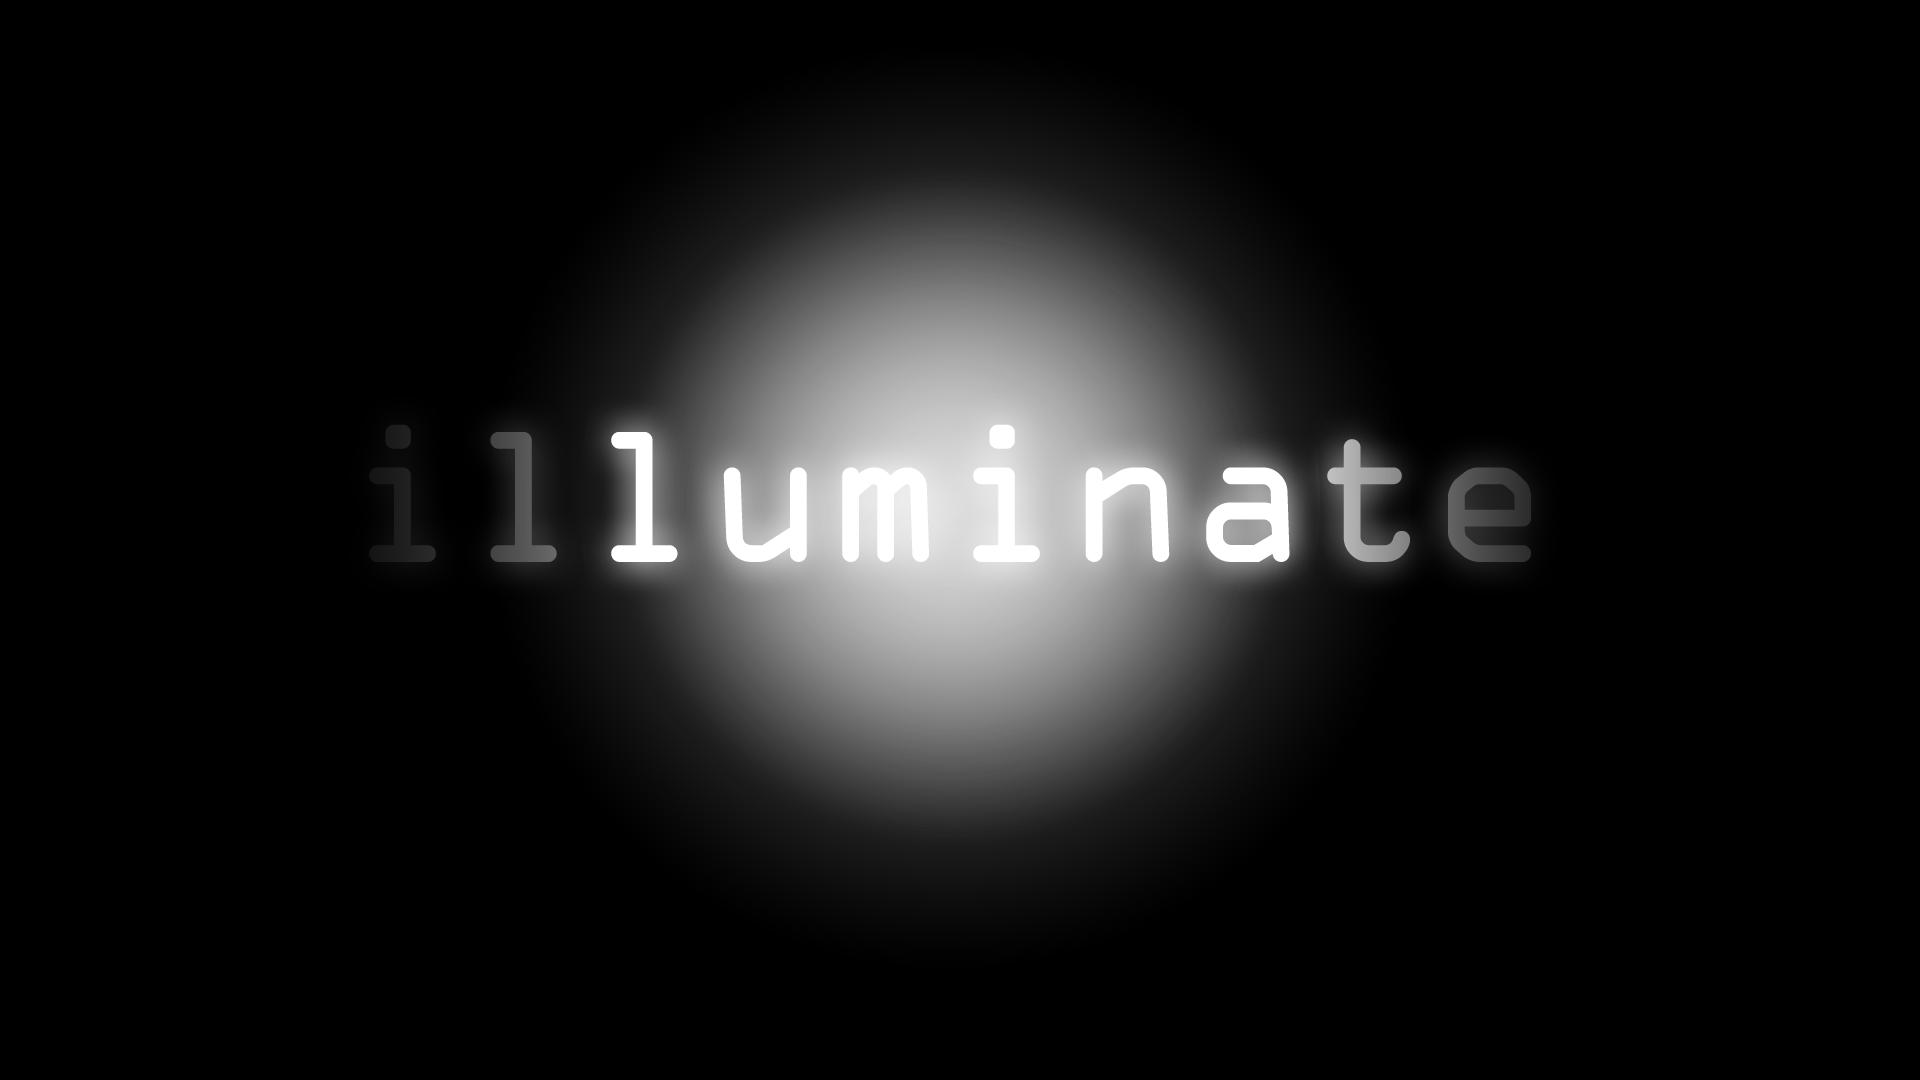 illuminate | Global Game Jam®